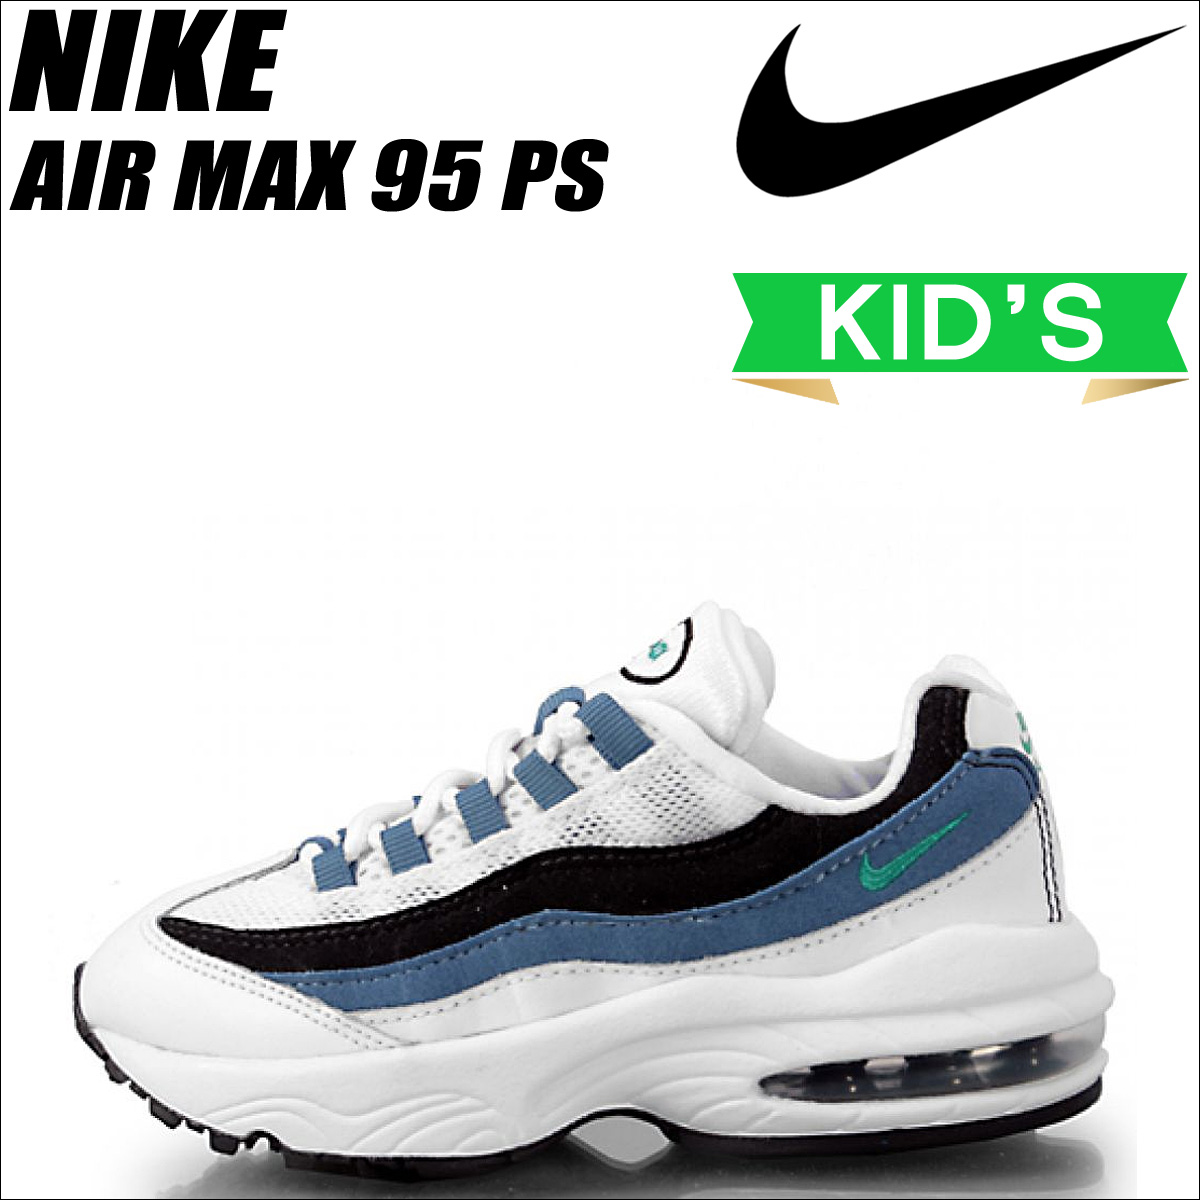 95 Nike Sold